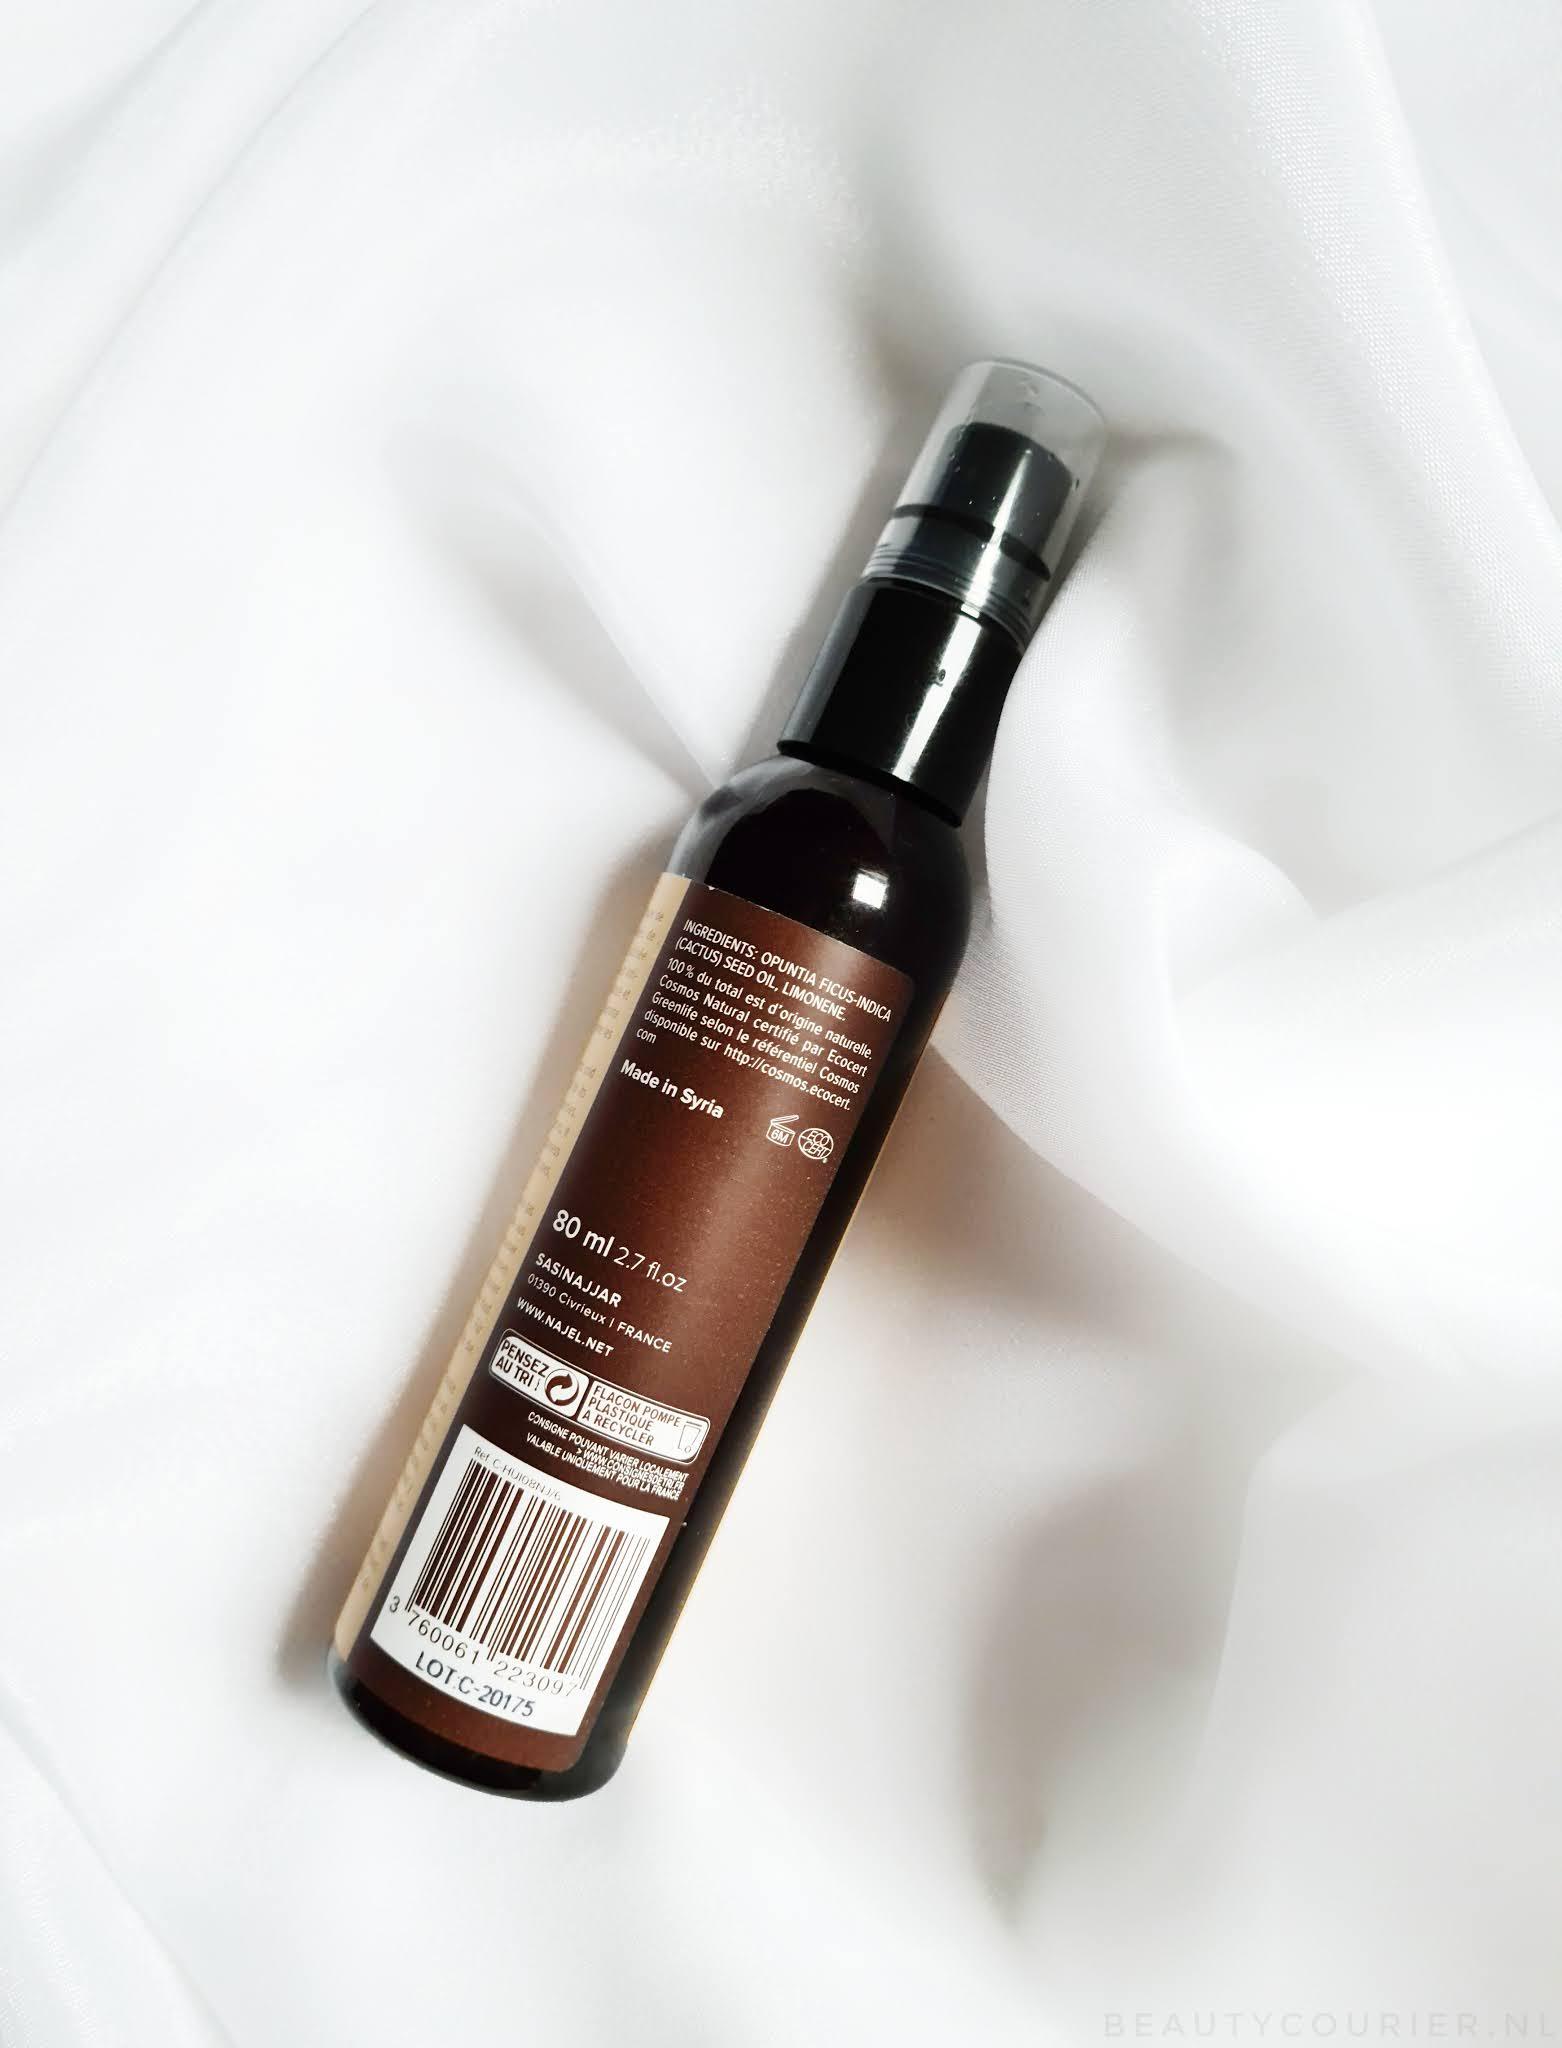 najel prickly pear oil. prickly pear oil benefits